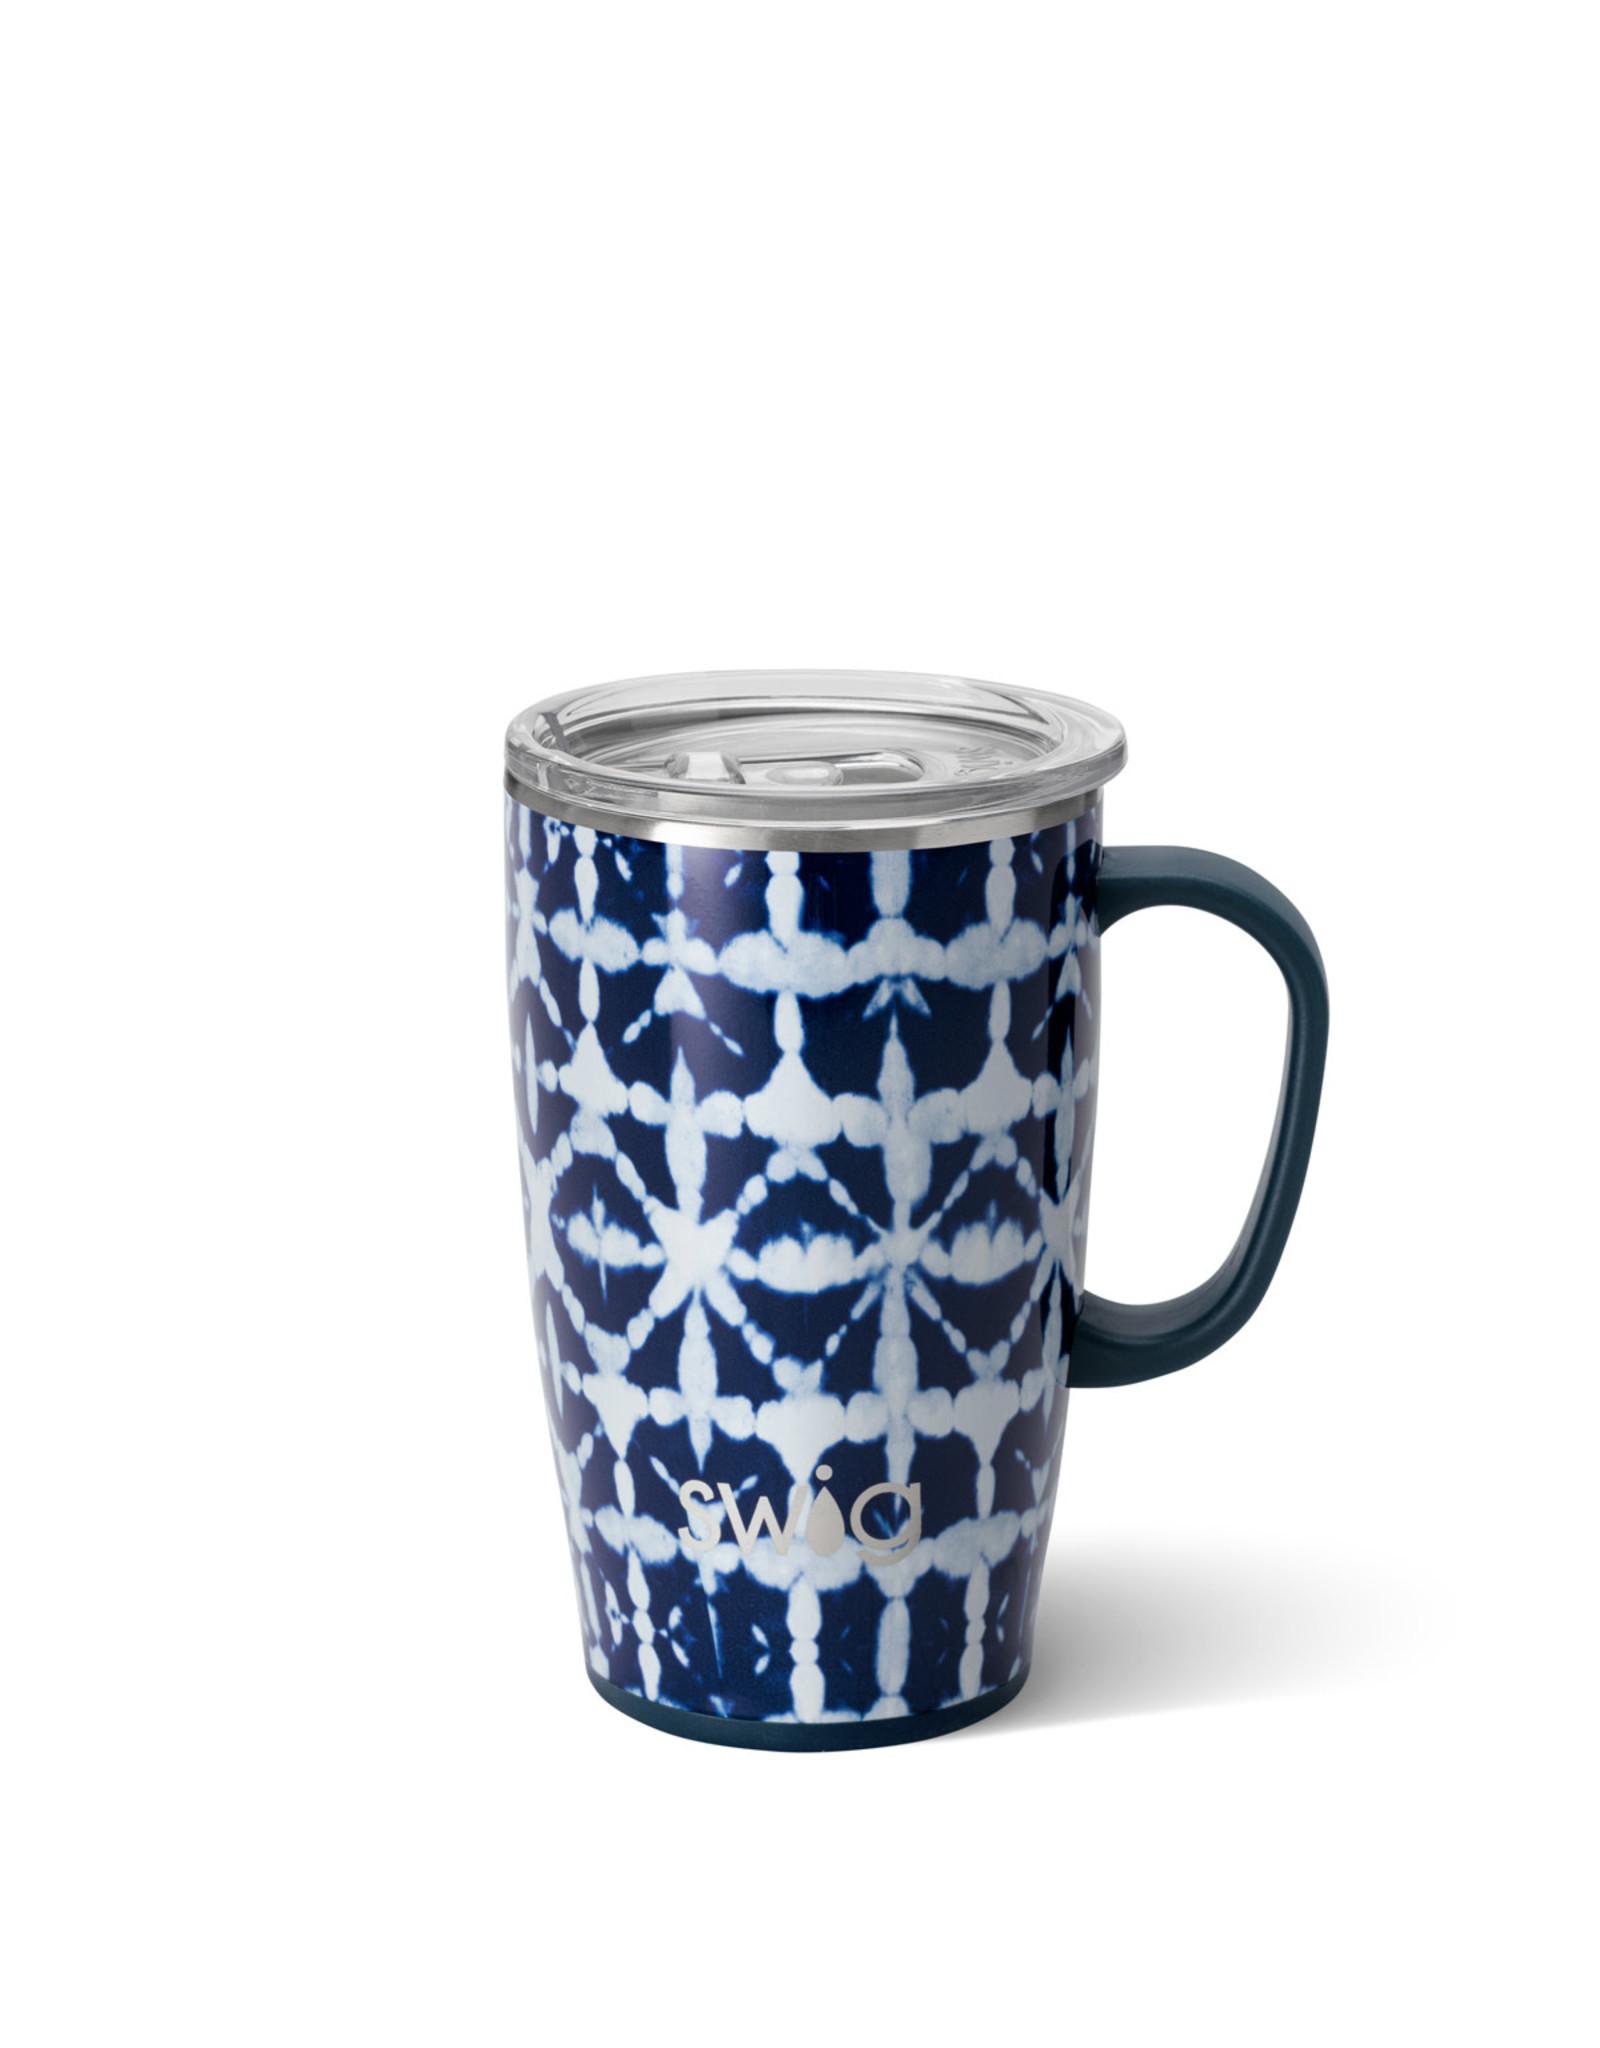 Indigo Isles mug